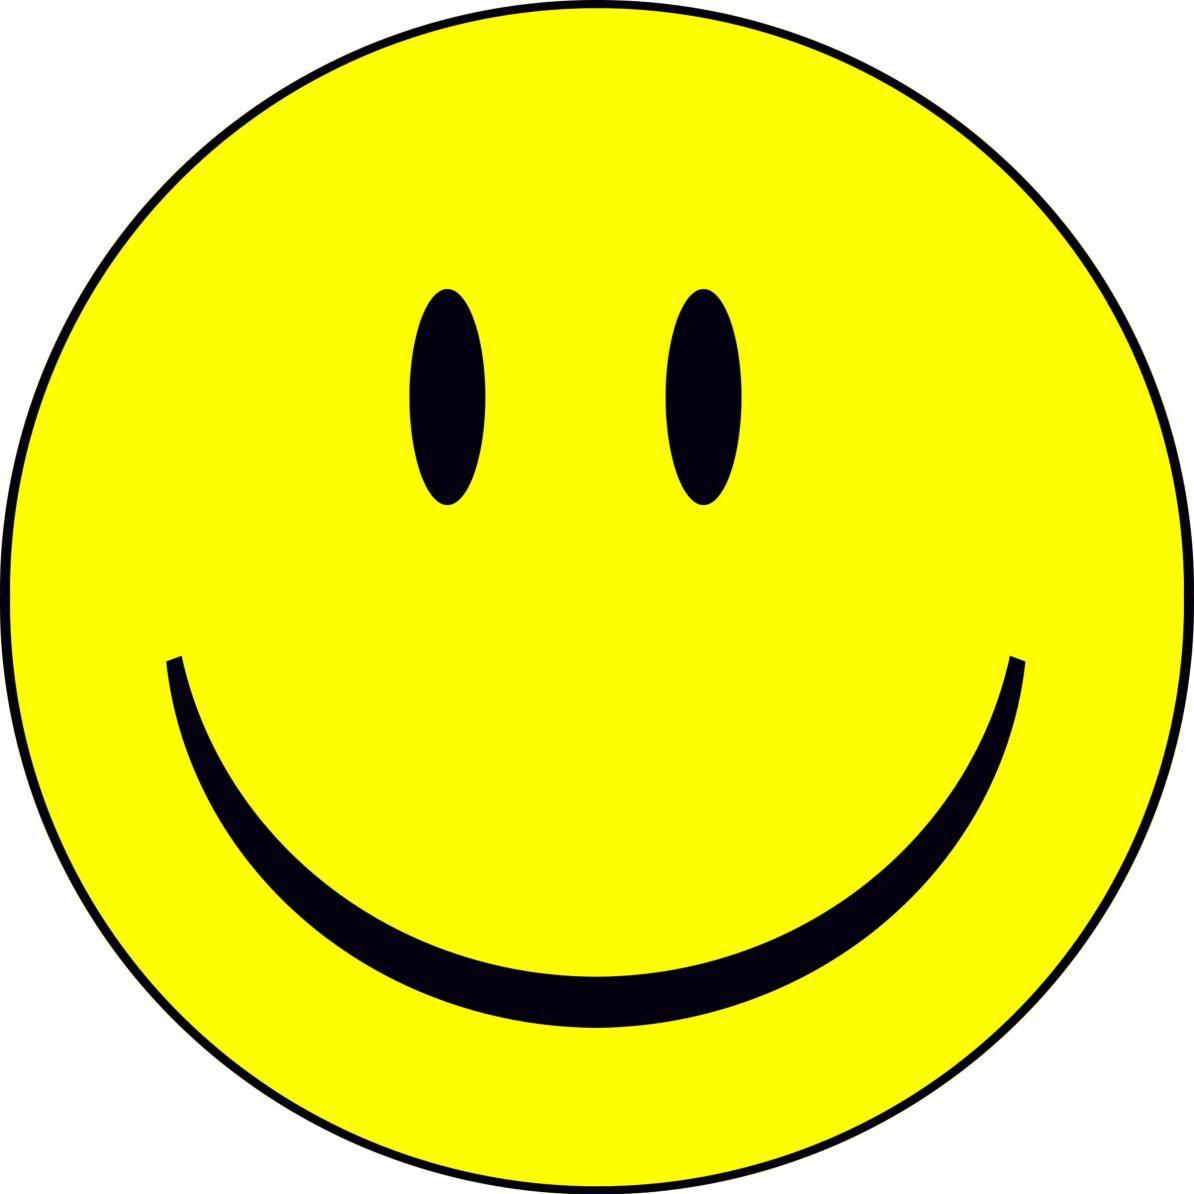 happy face # 3